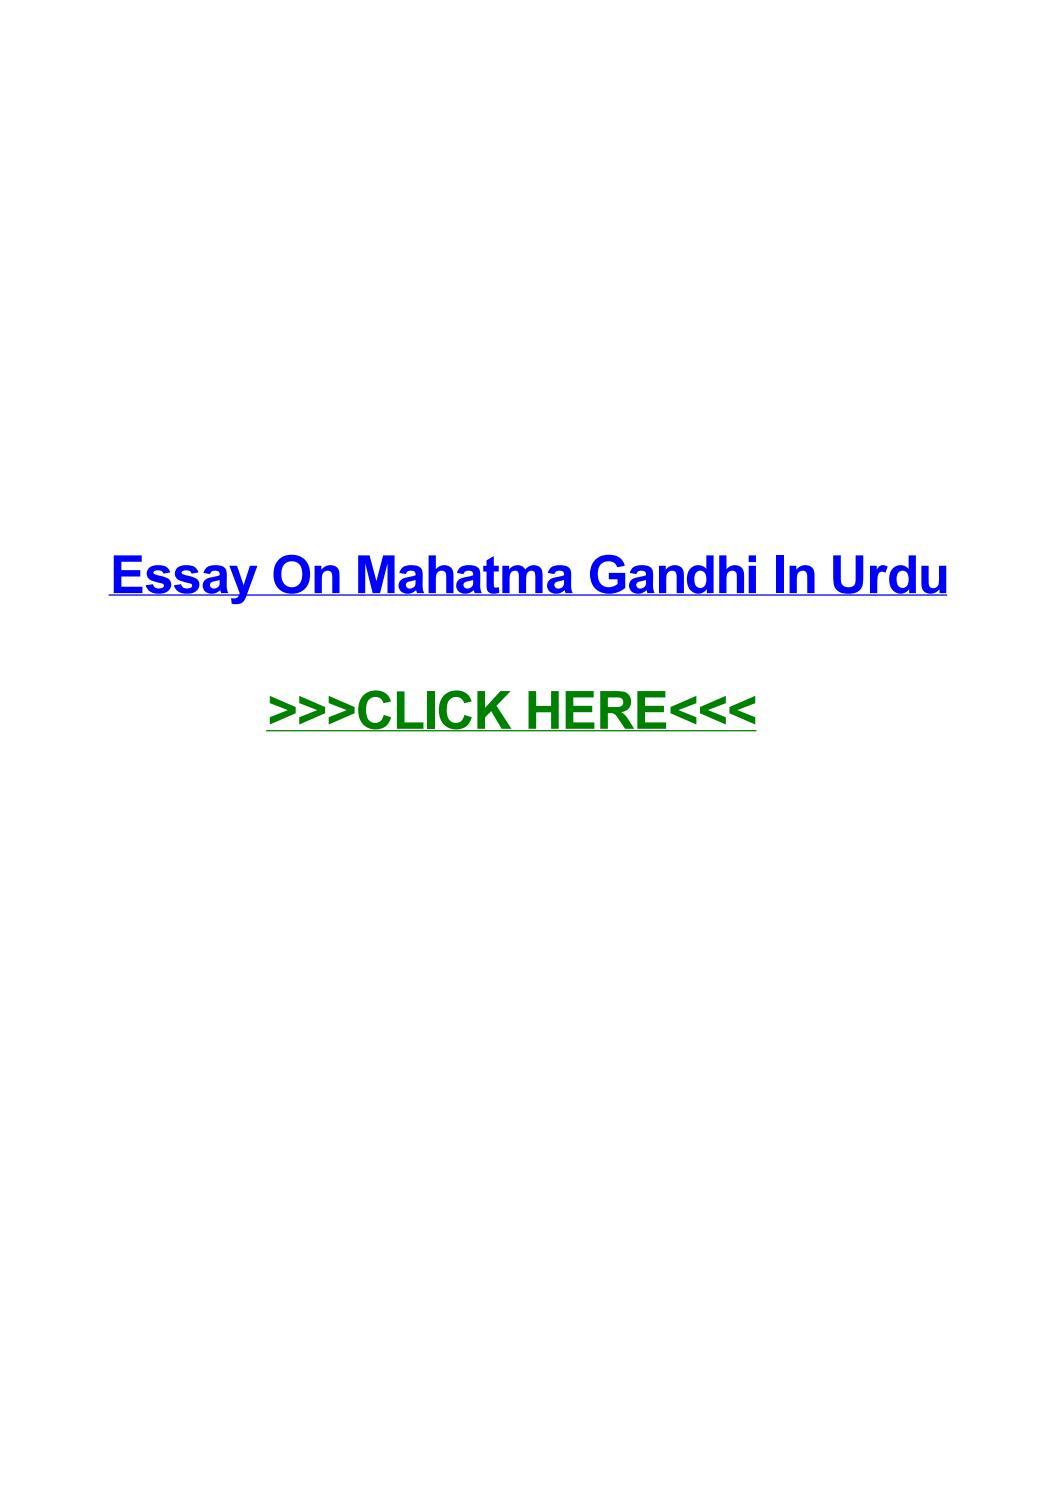 015 Mahatma Gandhi Essay In Urdu Page 1 Imposing Language Jayanti Speech Full